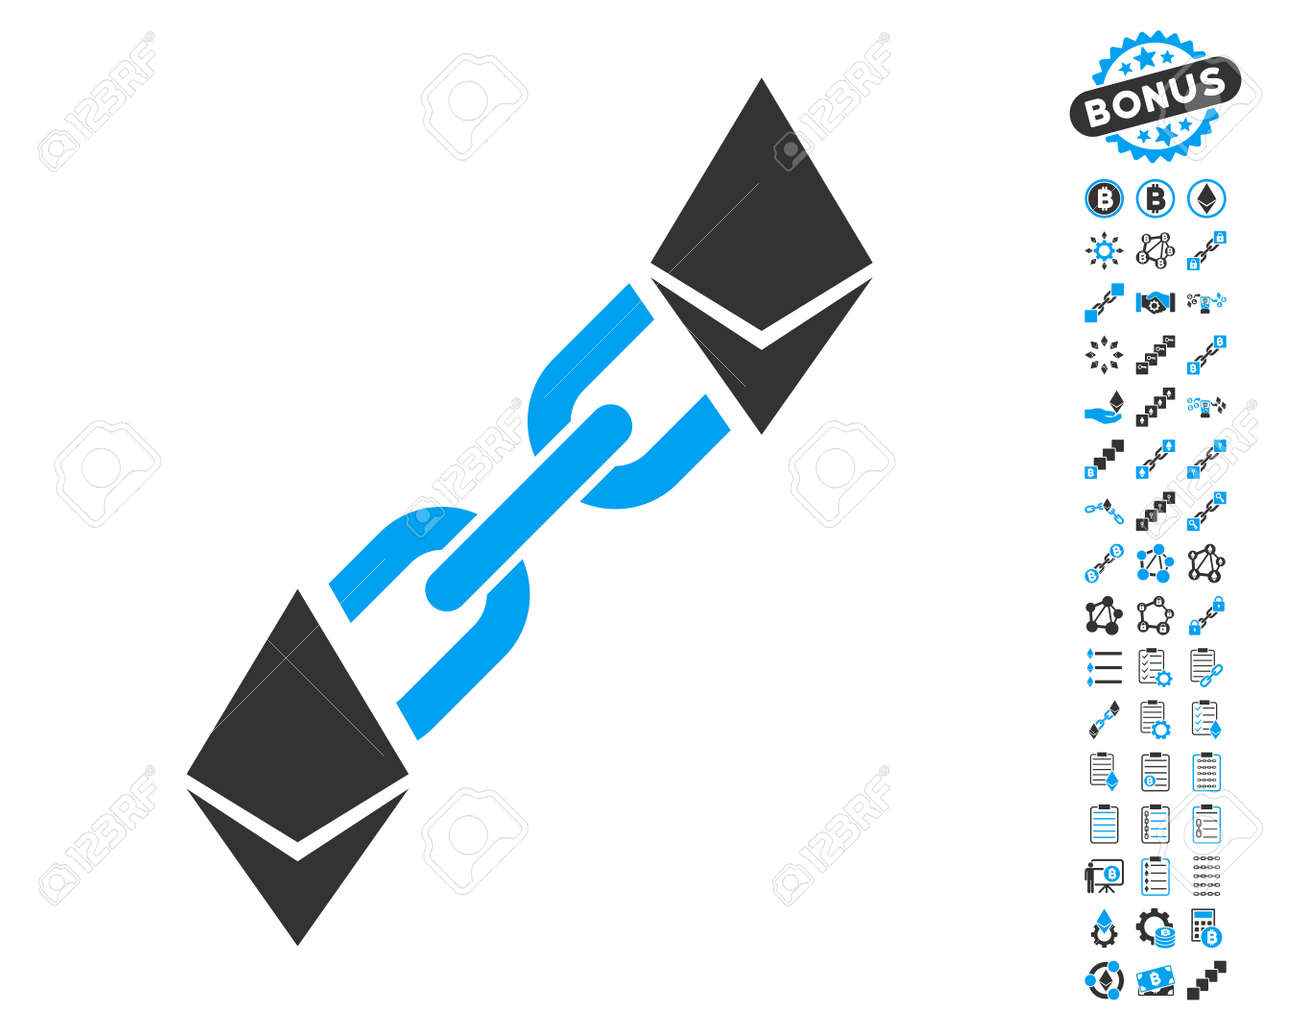 Ethereum Blockchain Icon With Bonus Clip Art Vector Illustration Style Is Flat Iconic Symbols